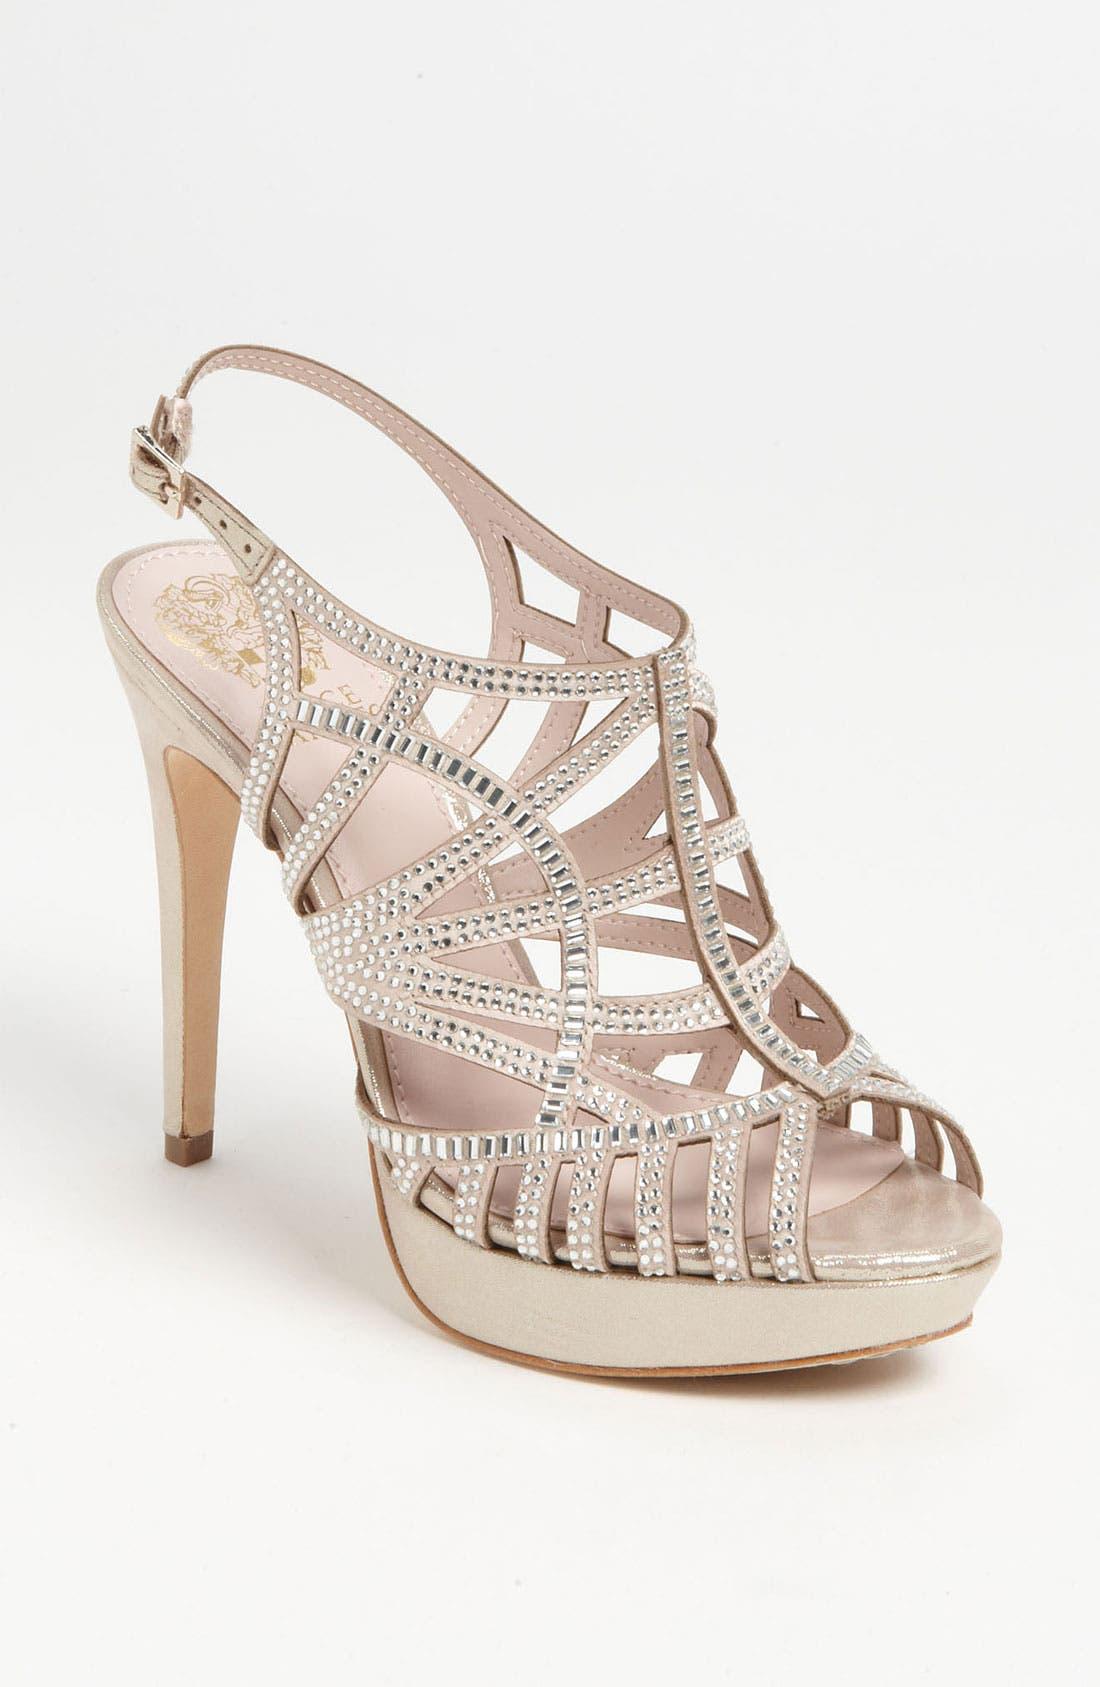 Main Image - Vince Camuto 'Janene' Sandal